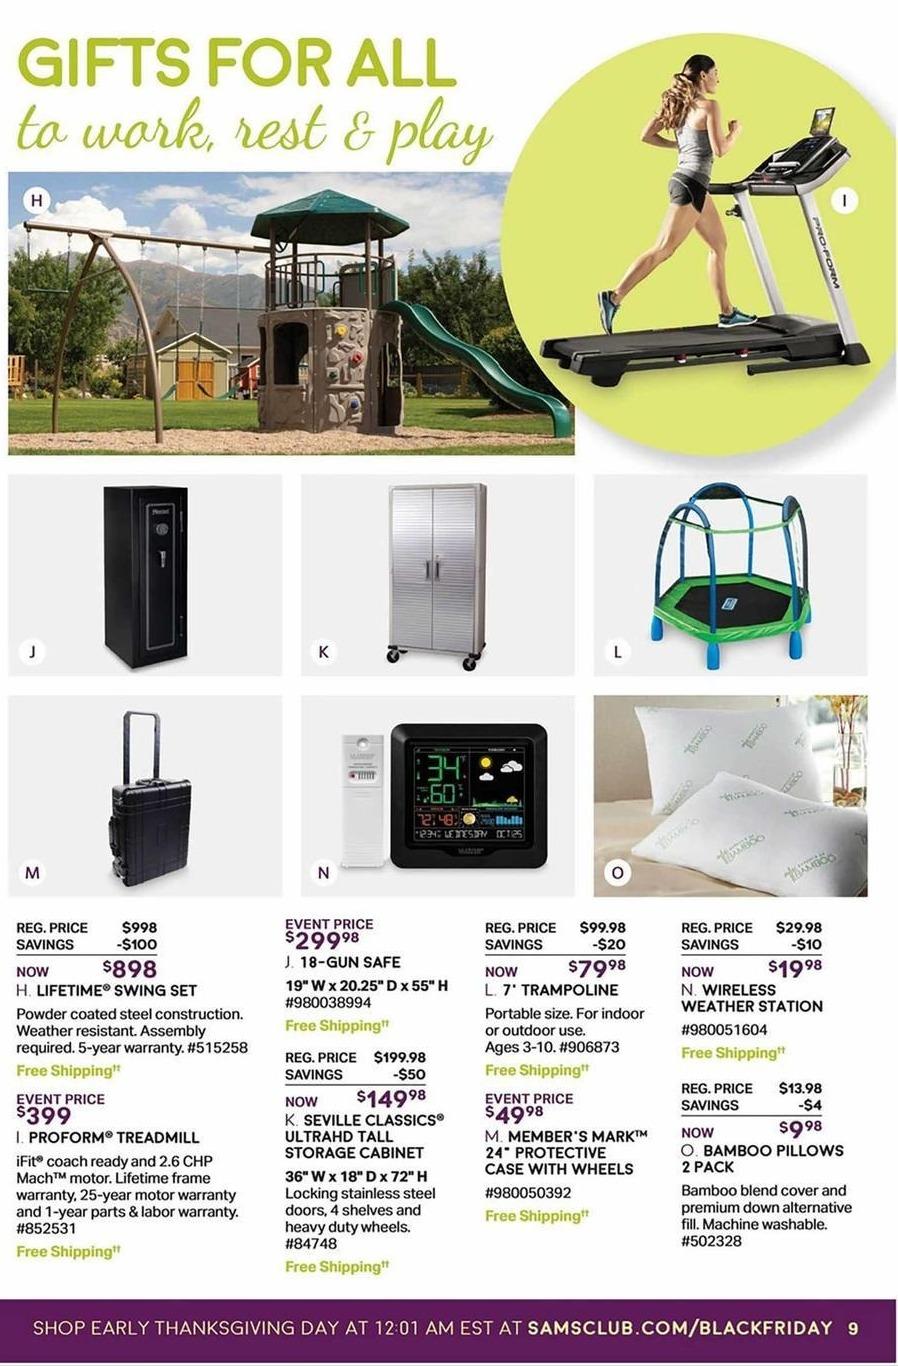 wavy swing with lifetime set bar foot index adventure slide monkey